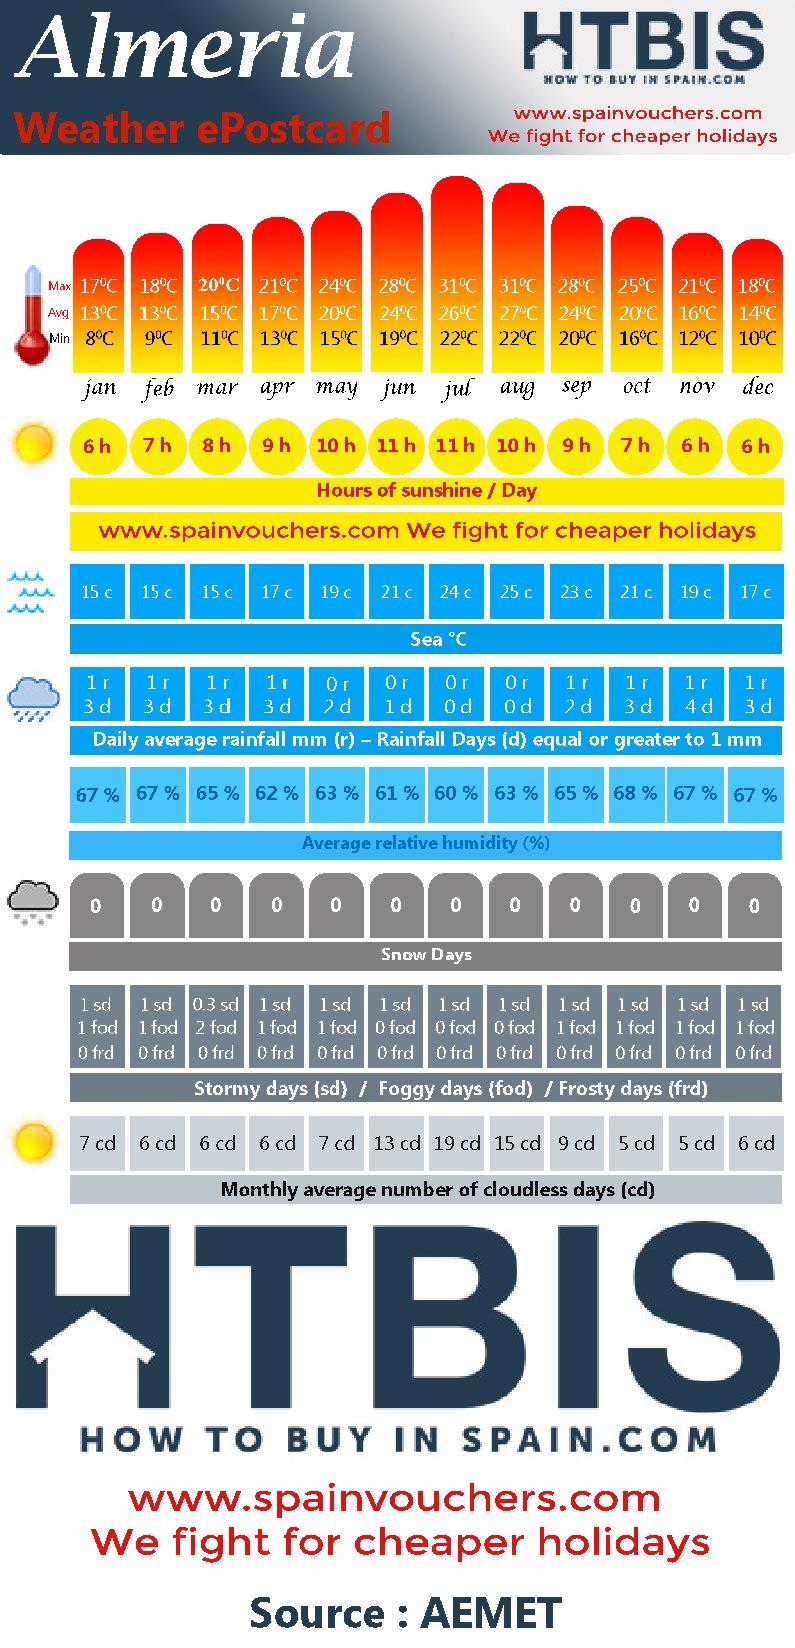 Almeria, Weather statistic Infographic